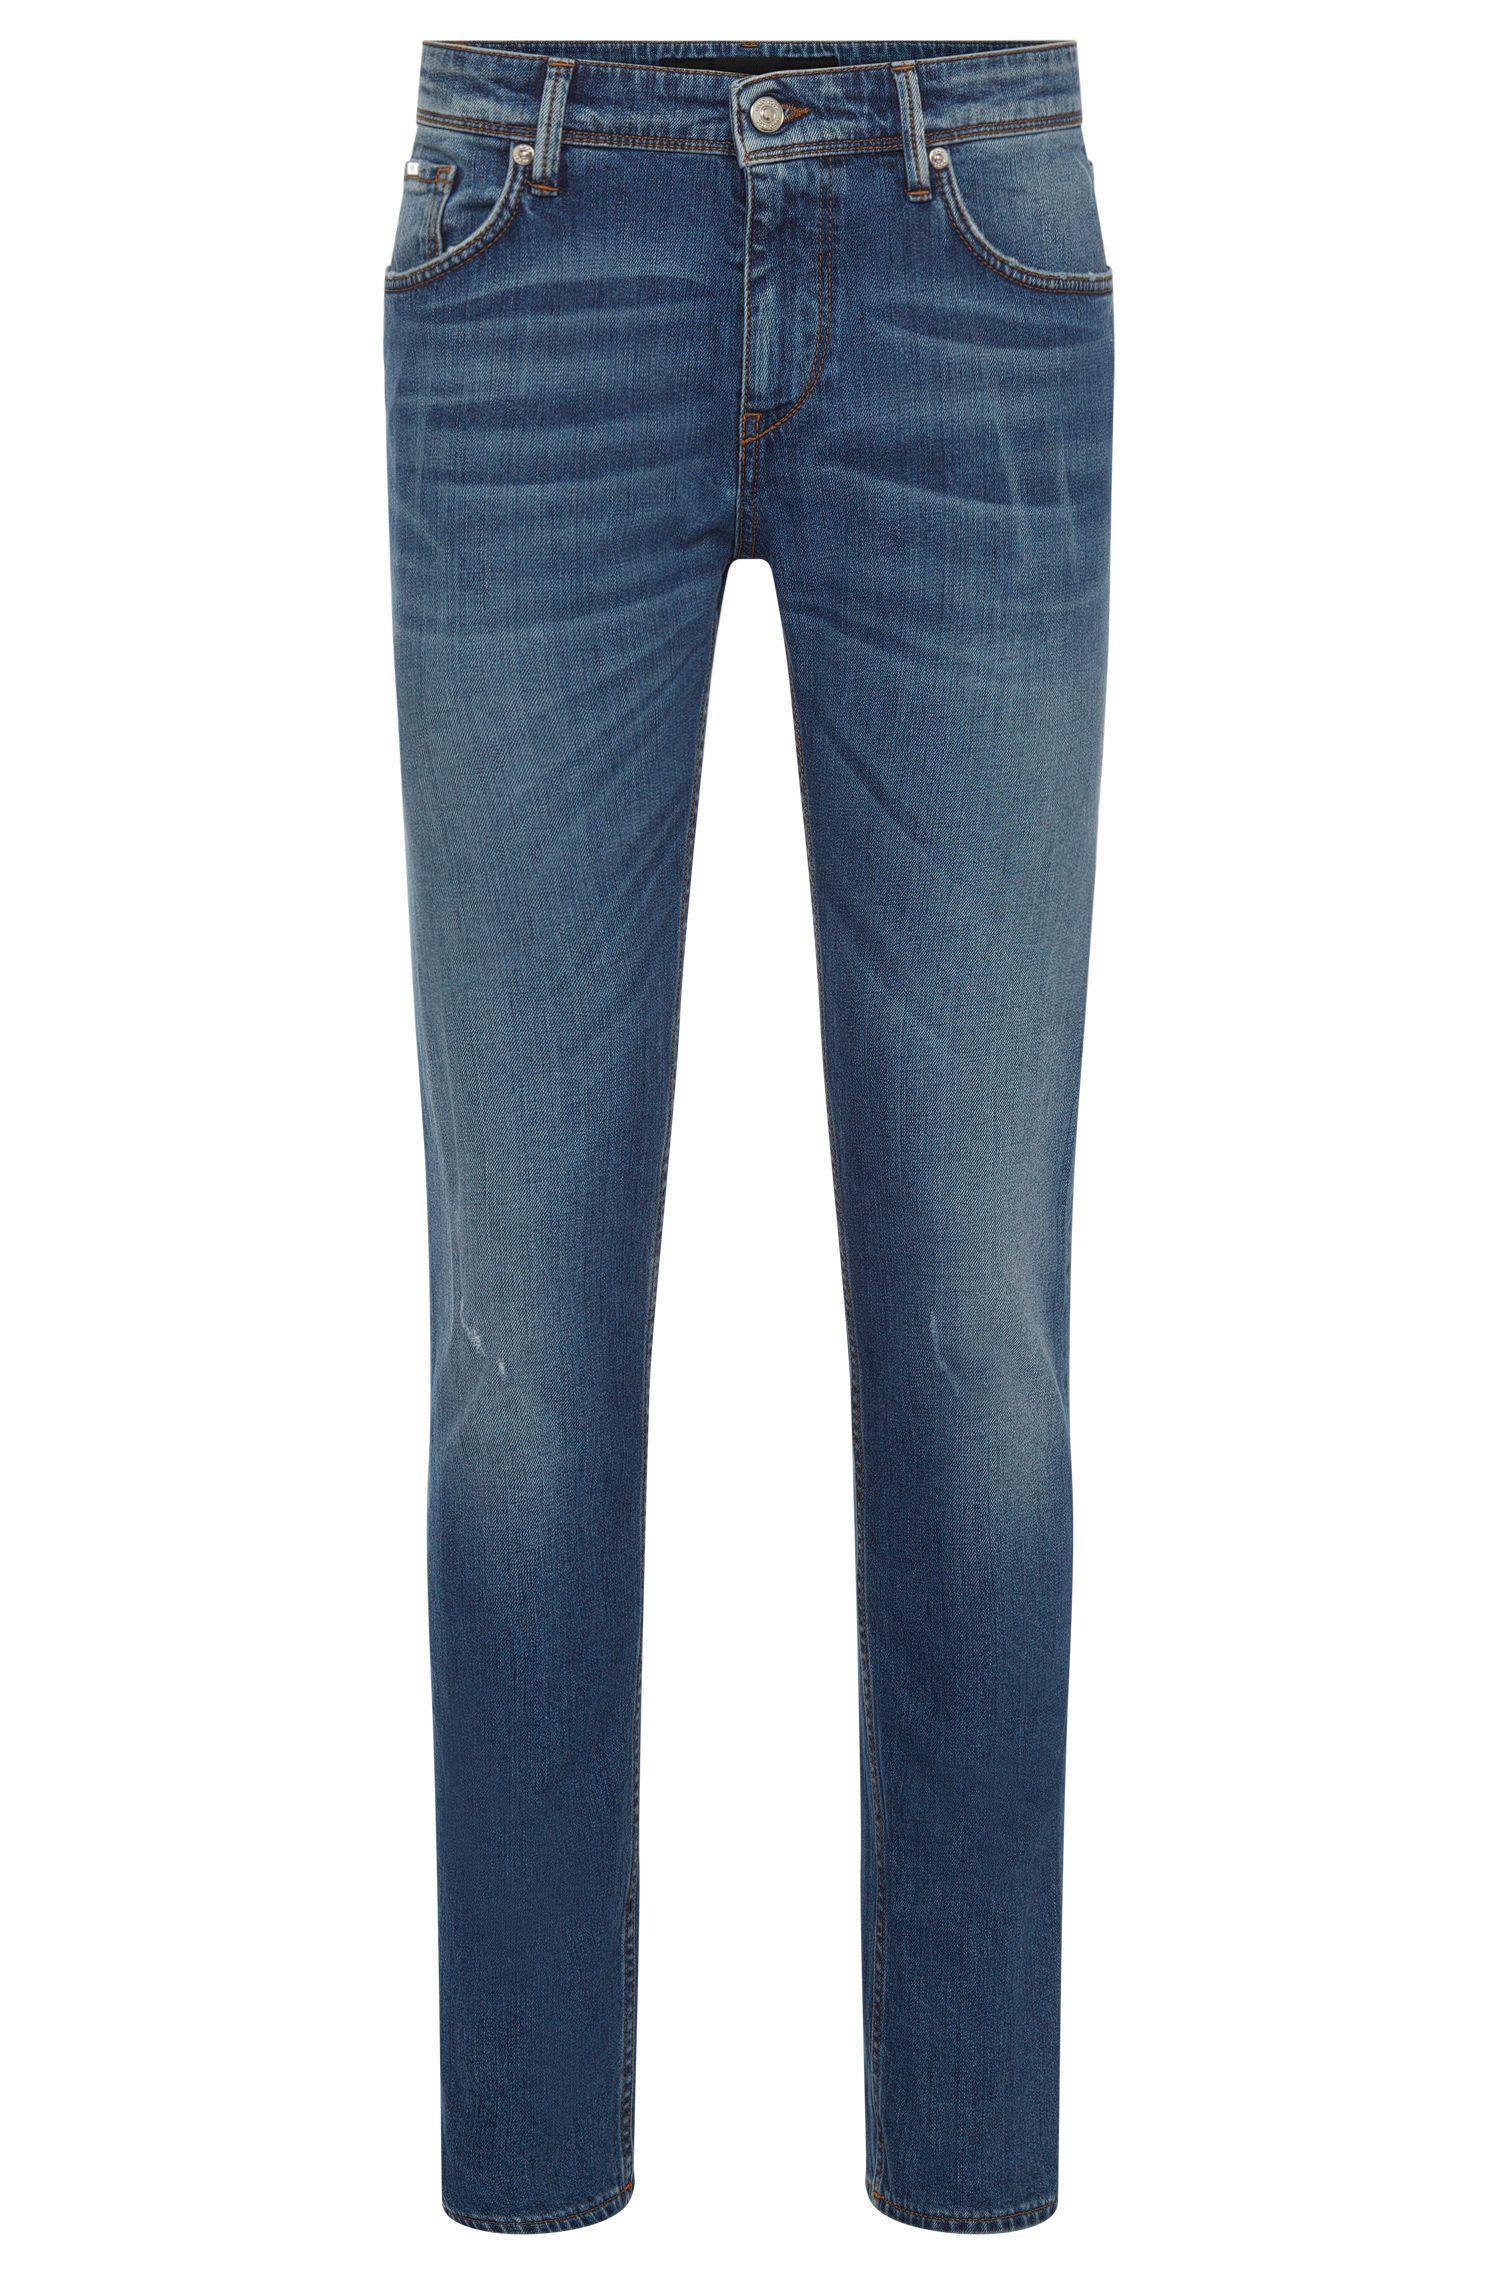 'Charleston' | Extra Slim Fit, 10.5 oz Italian Stretch Cotton Jeans